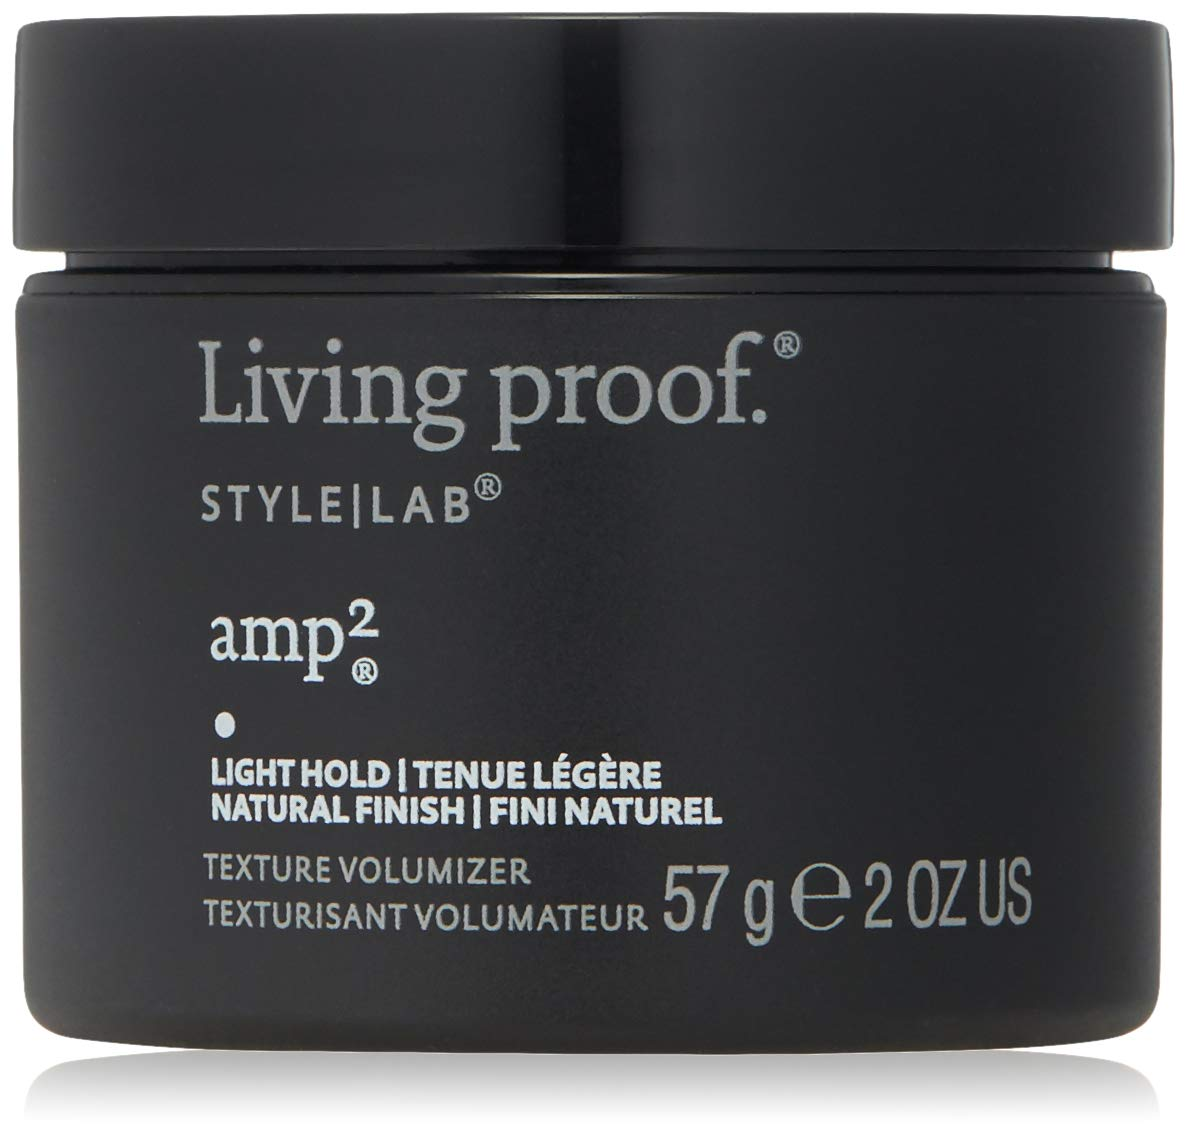 Living proof Amp Texture Volumizer, 2 oz: Premium Beauty